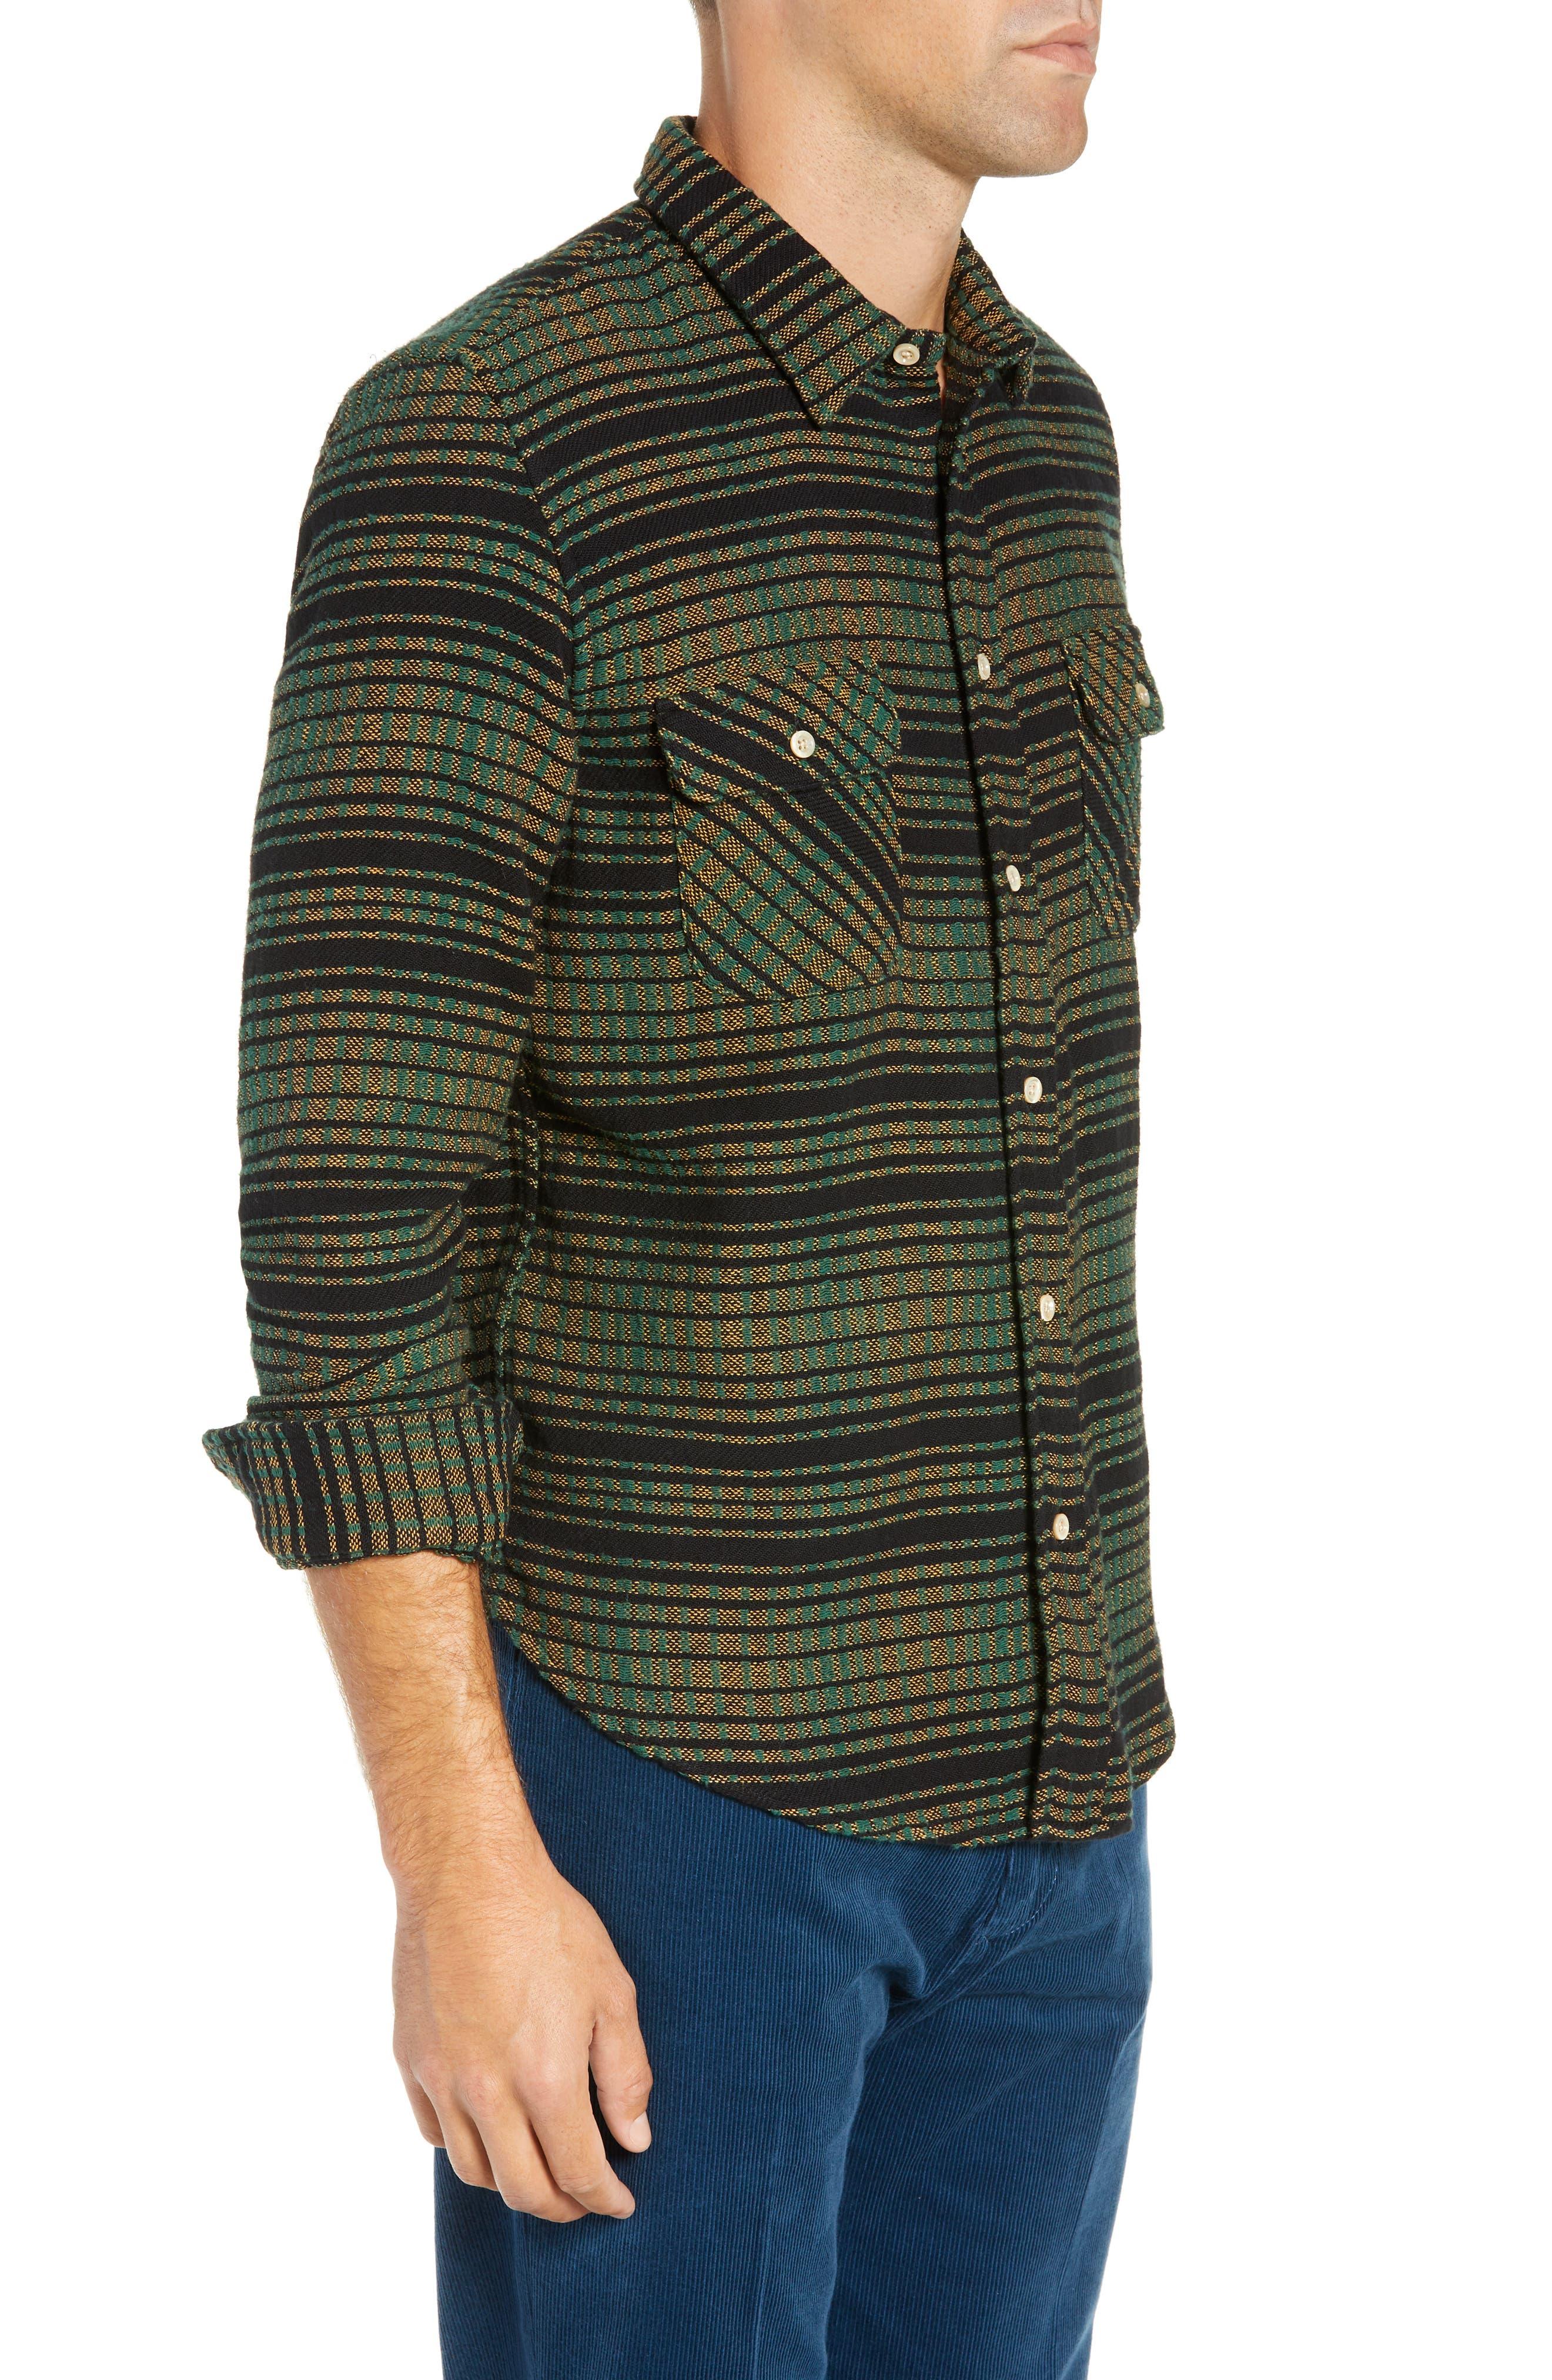 LEVI'S<SUP>®</SUP> VINTAGE CLOTHING,                             Shorthorn Slim Fit Sport Shirt,                             Alternate thumbnail 4, color,                             300